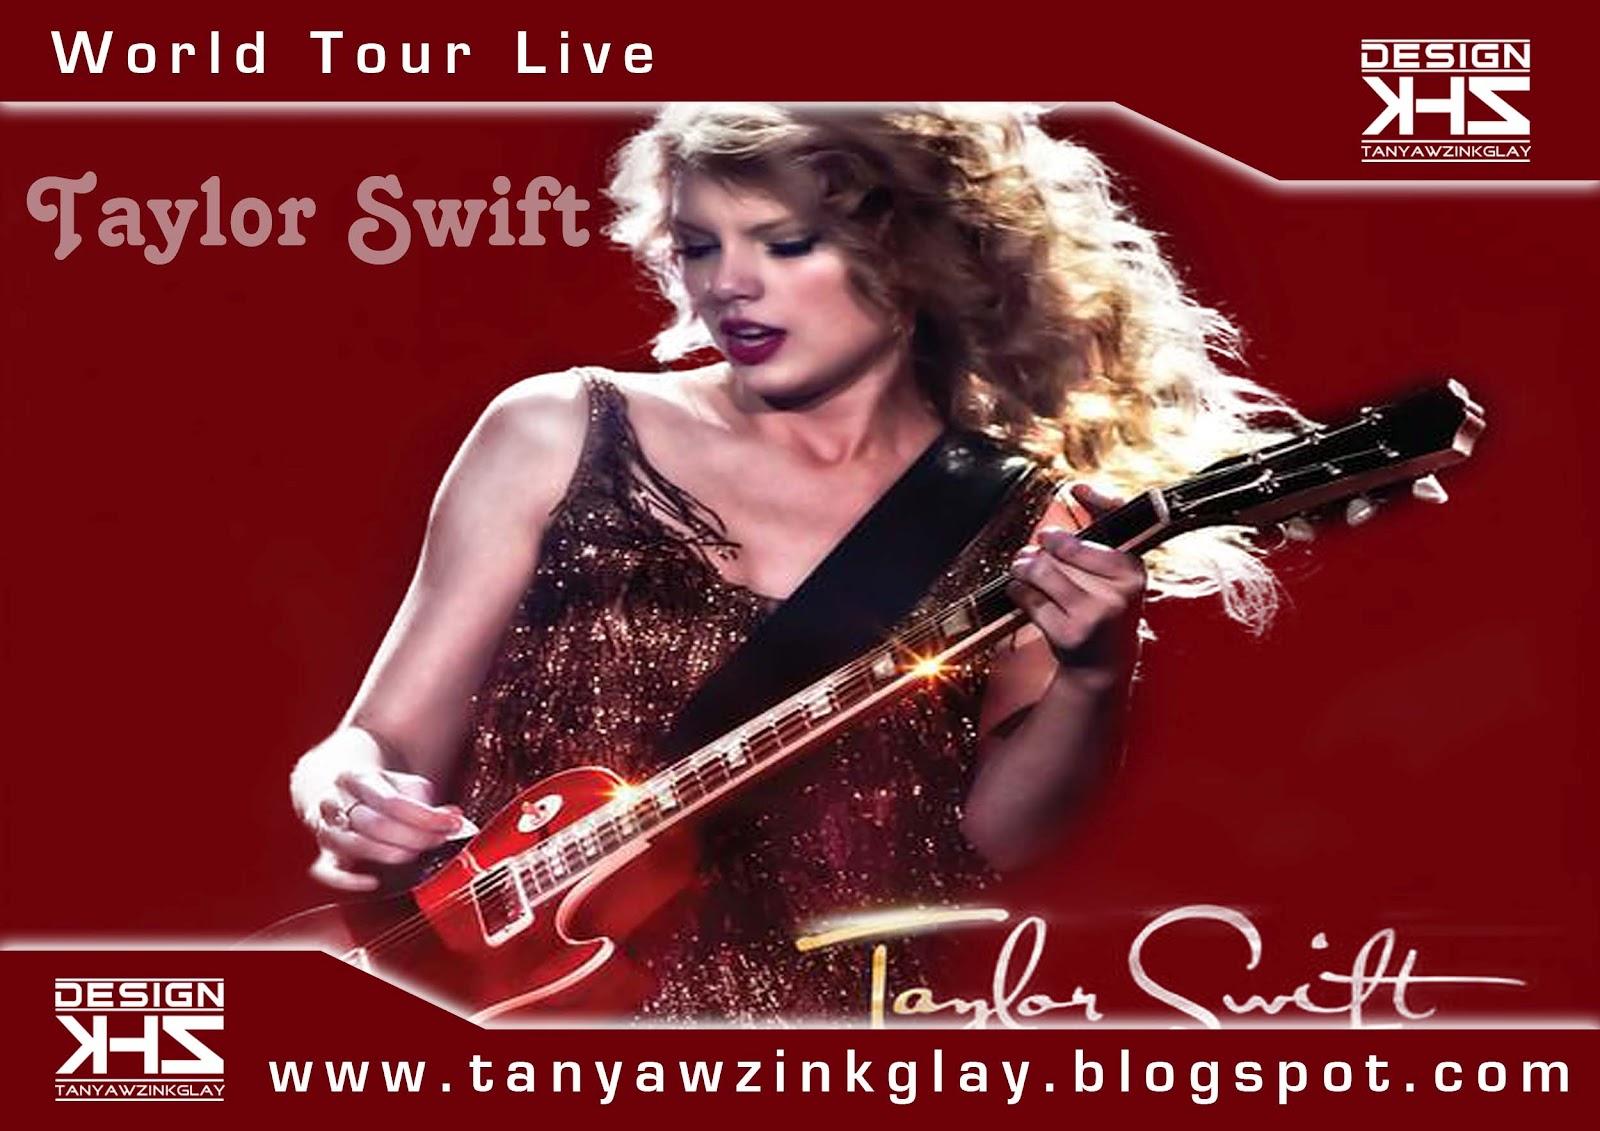 http://1.bp.blogspot.com/-VlyG59h9qzc/UECE6Ji_SOI/AAAAAAAAHIM/yzd_5-wGemY/s1600/Taylorswift+1.jpg